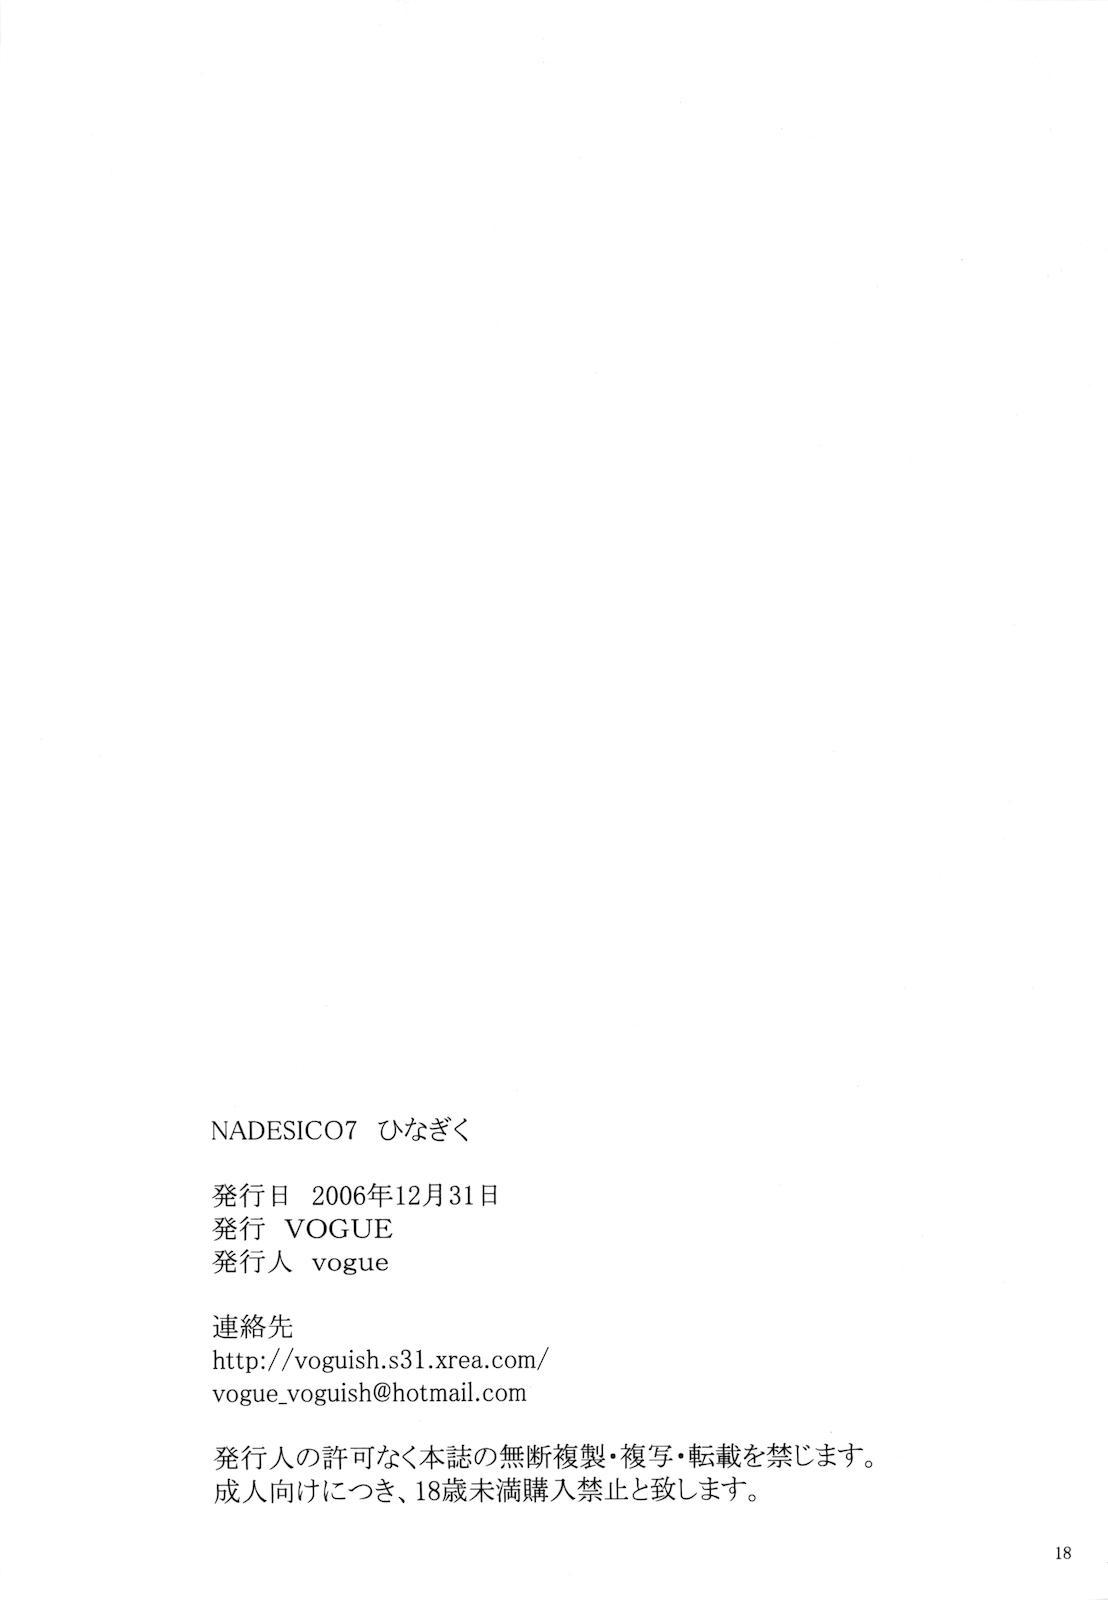 NADESICO 7 Hinagiku 17